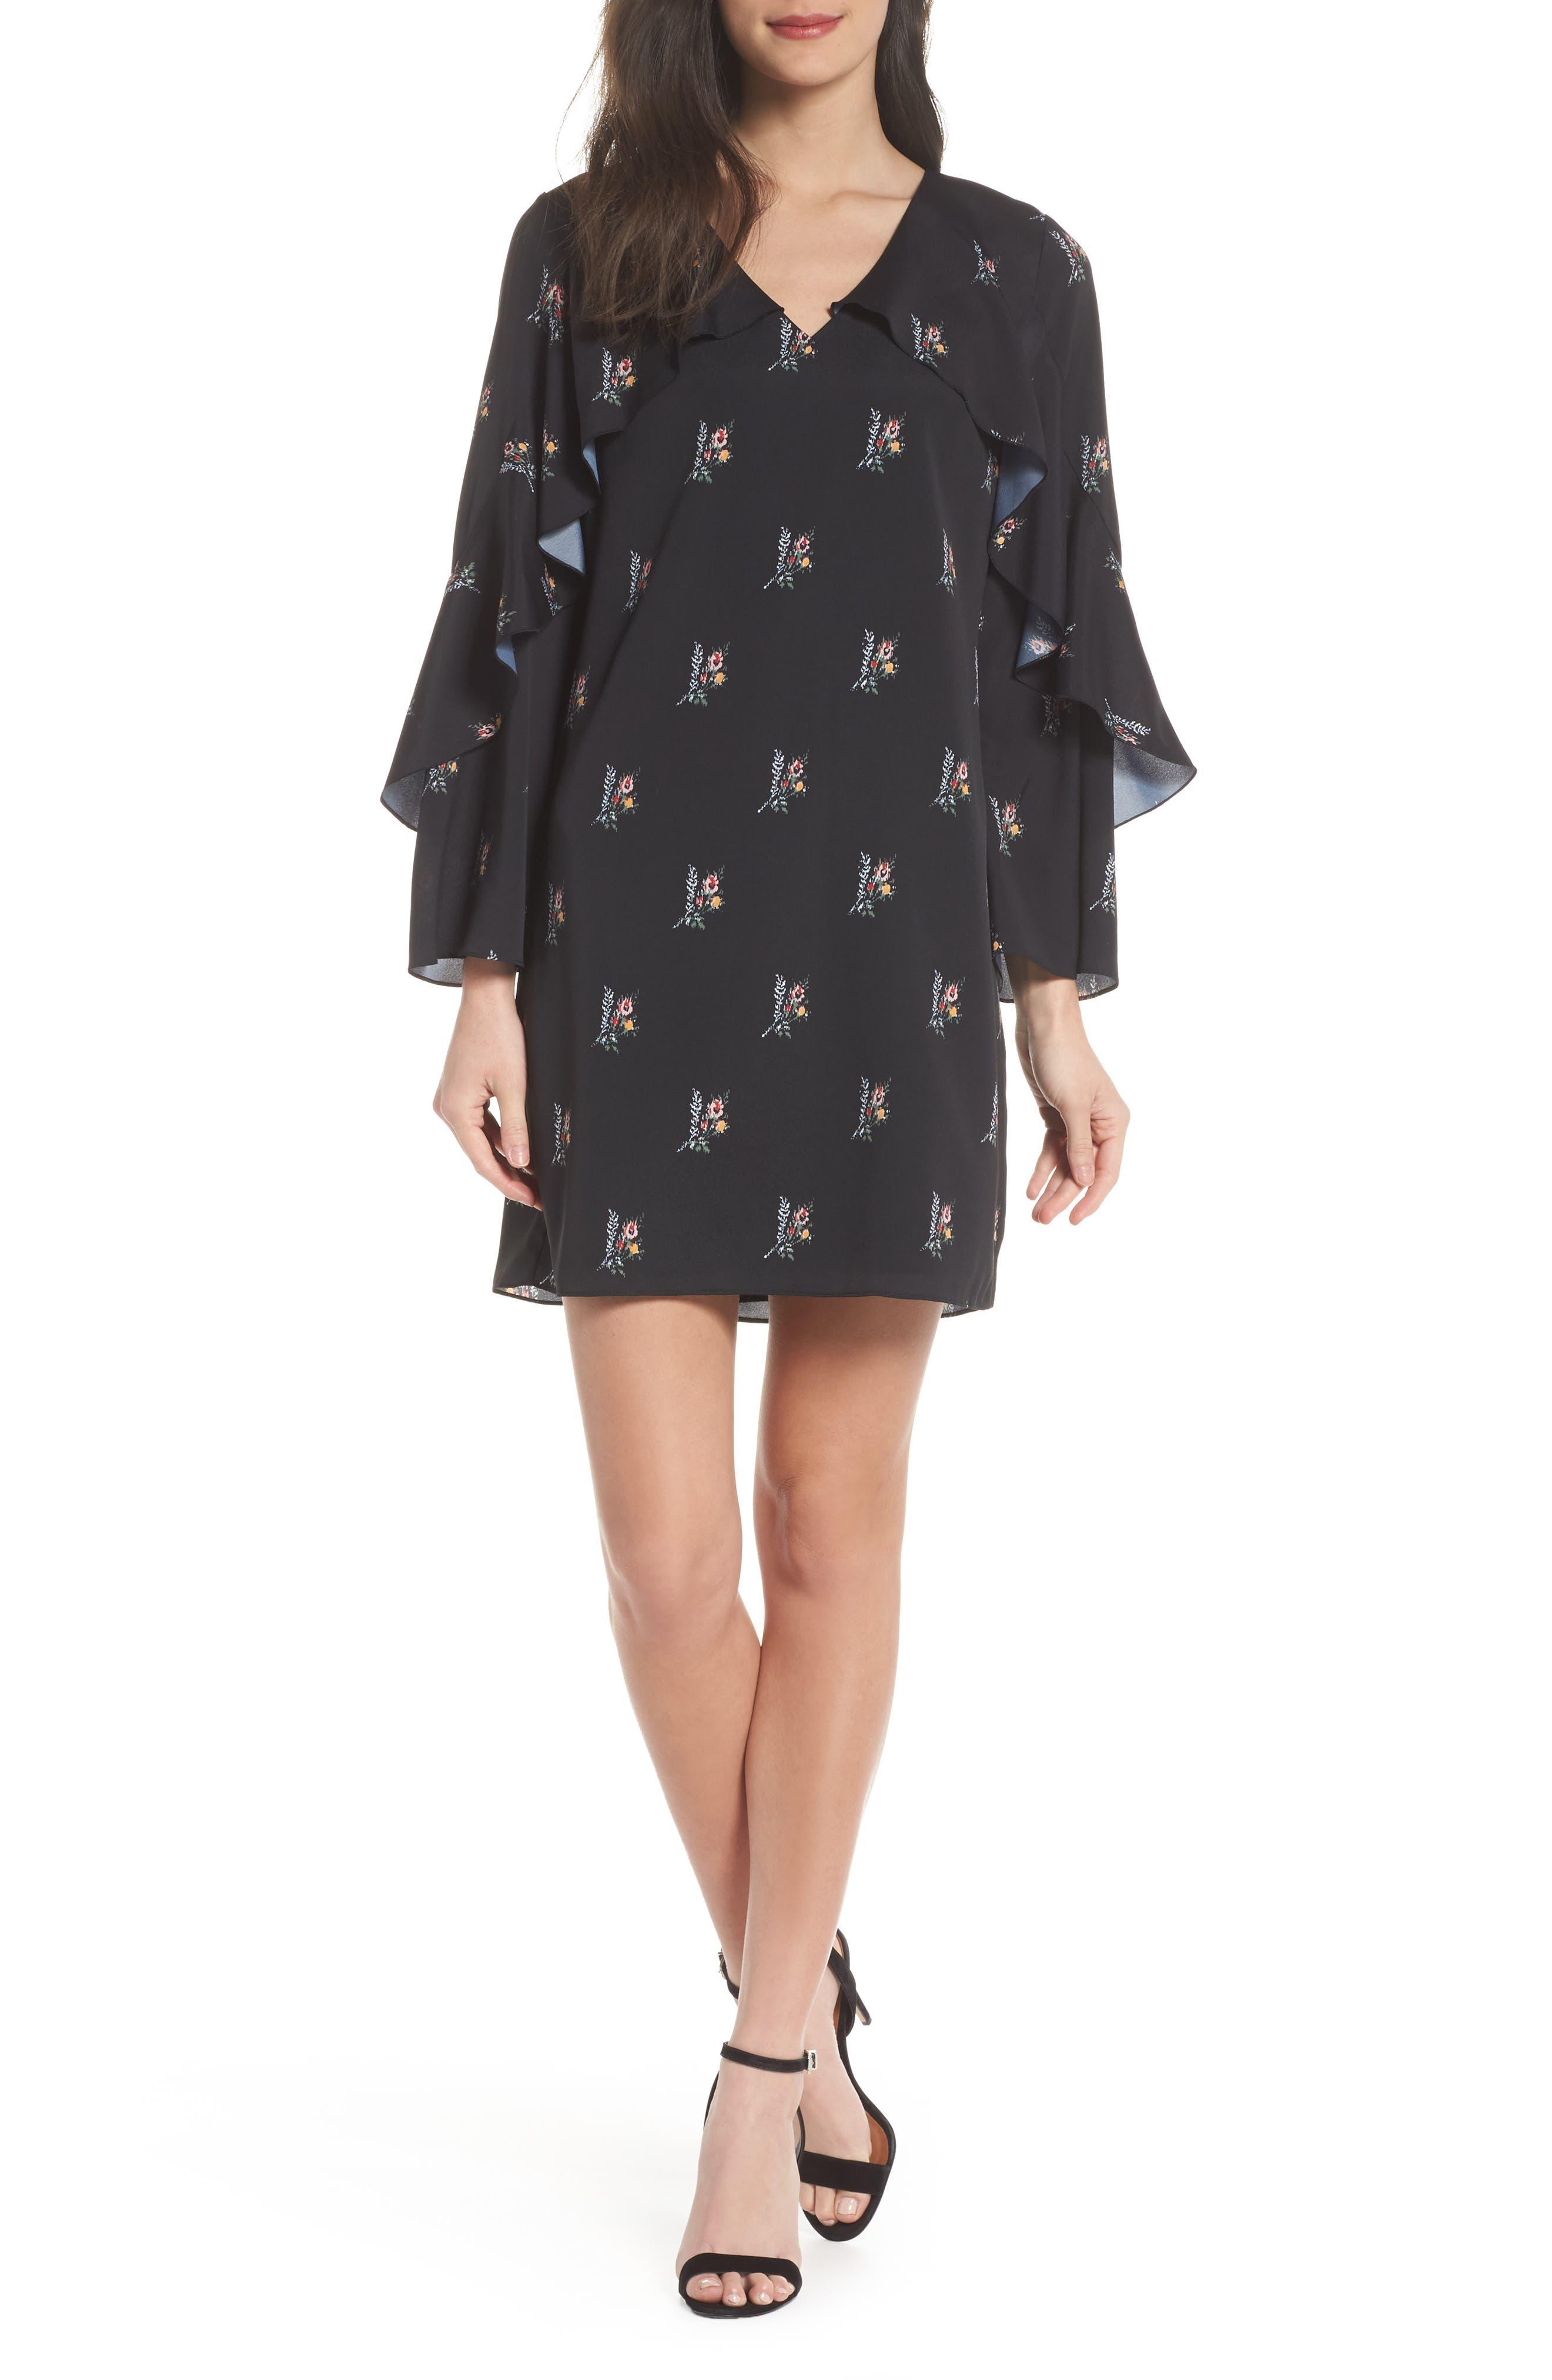 Kobi Halperin Olessia Ruffle Shift Dress